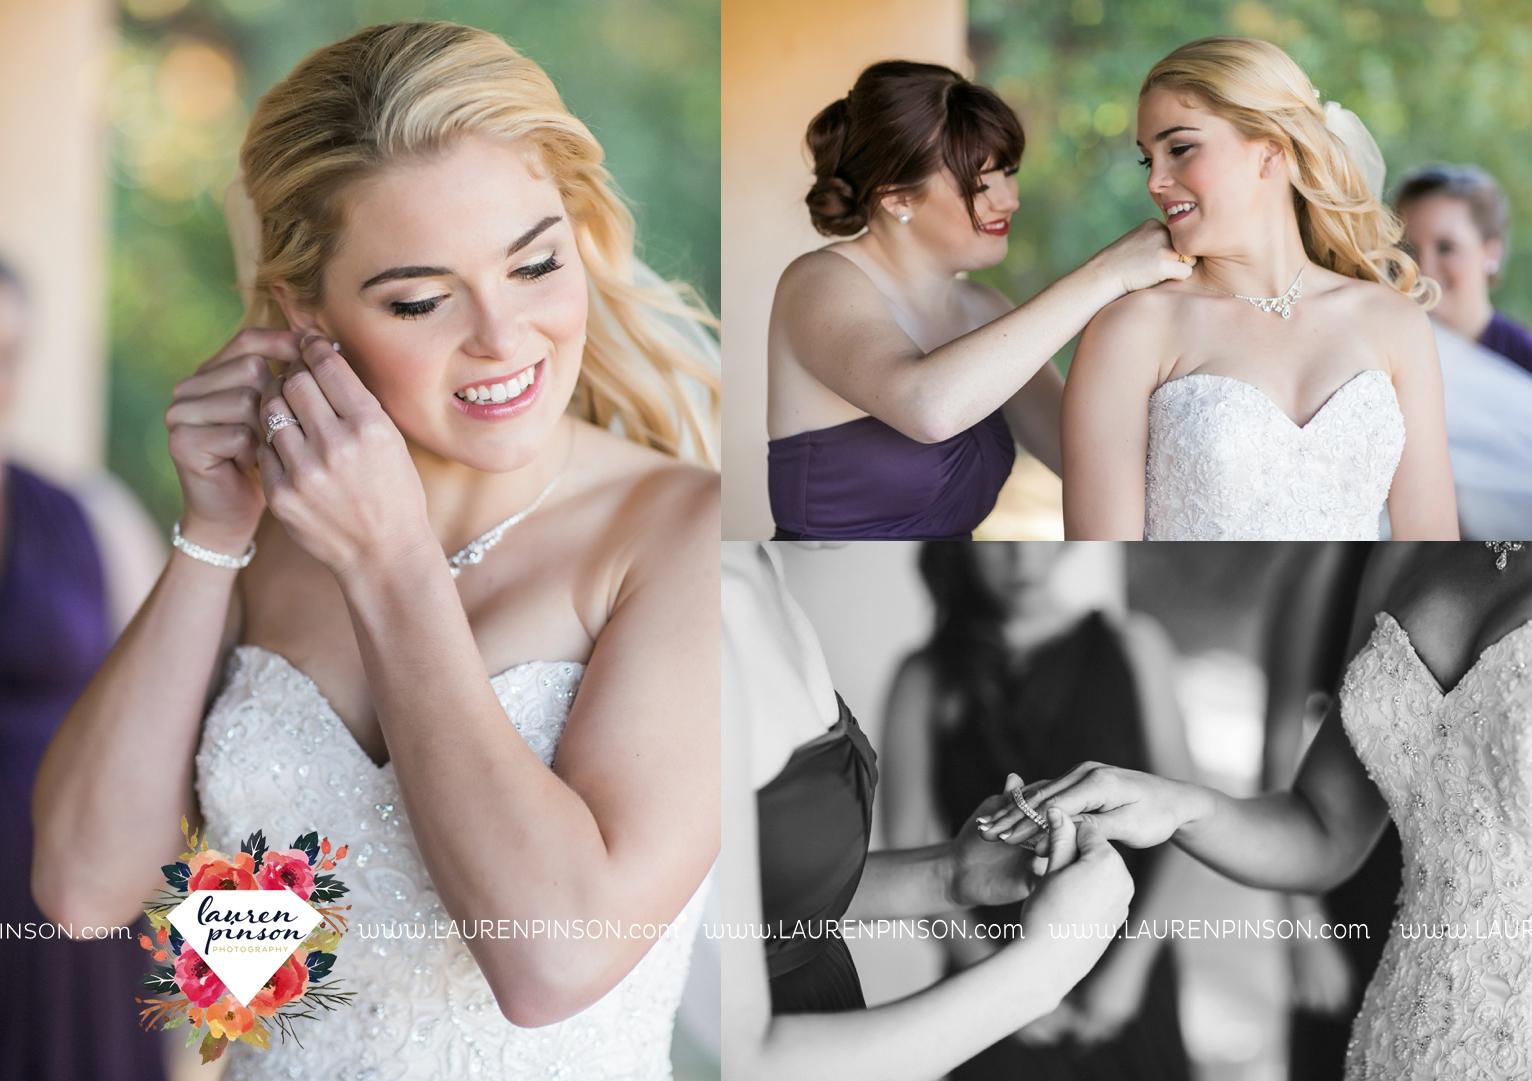 rustic-wichita-falls-texas-wedding-photographer-gold-glam-mayfield-events-market-street-united-allue-bridals-fall_1717.jpg